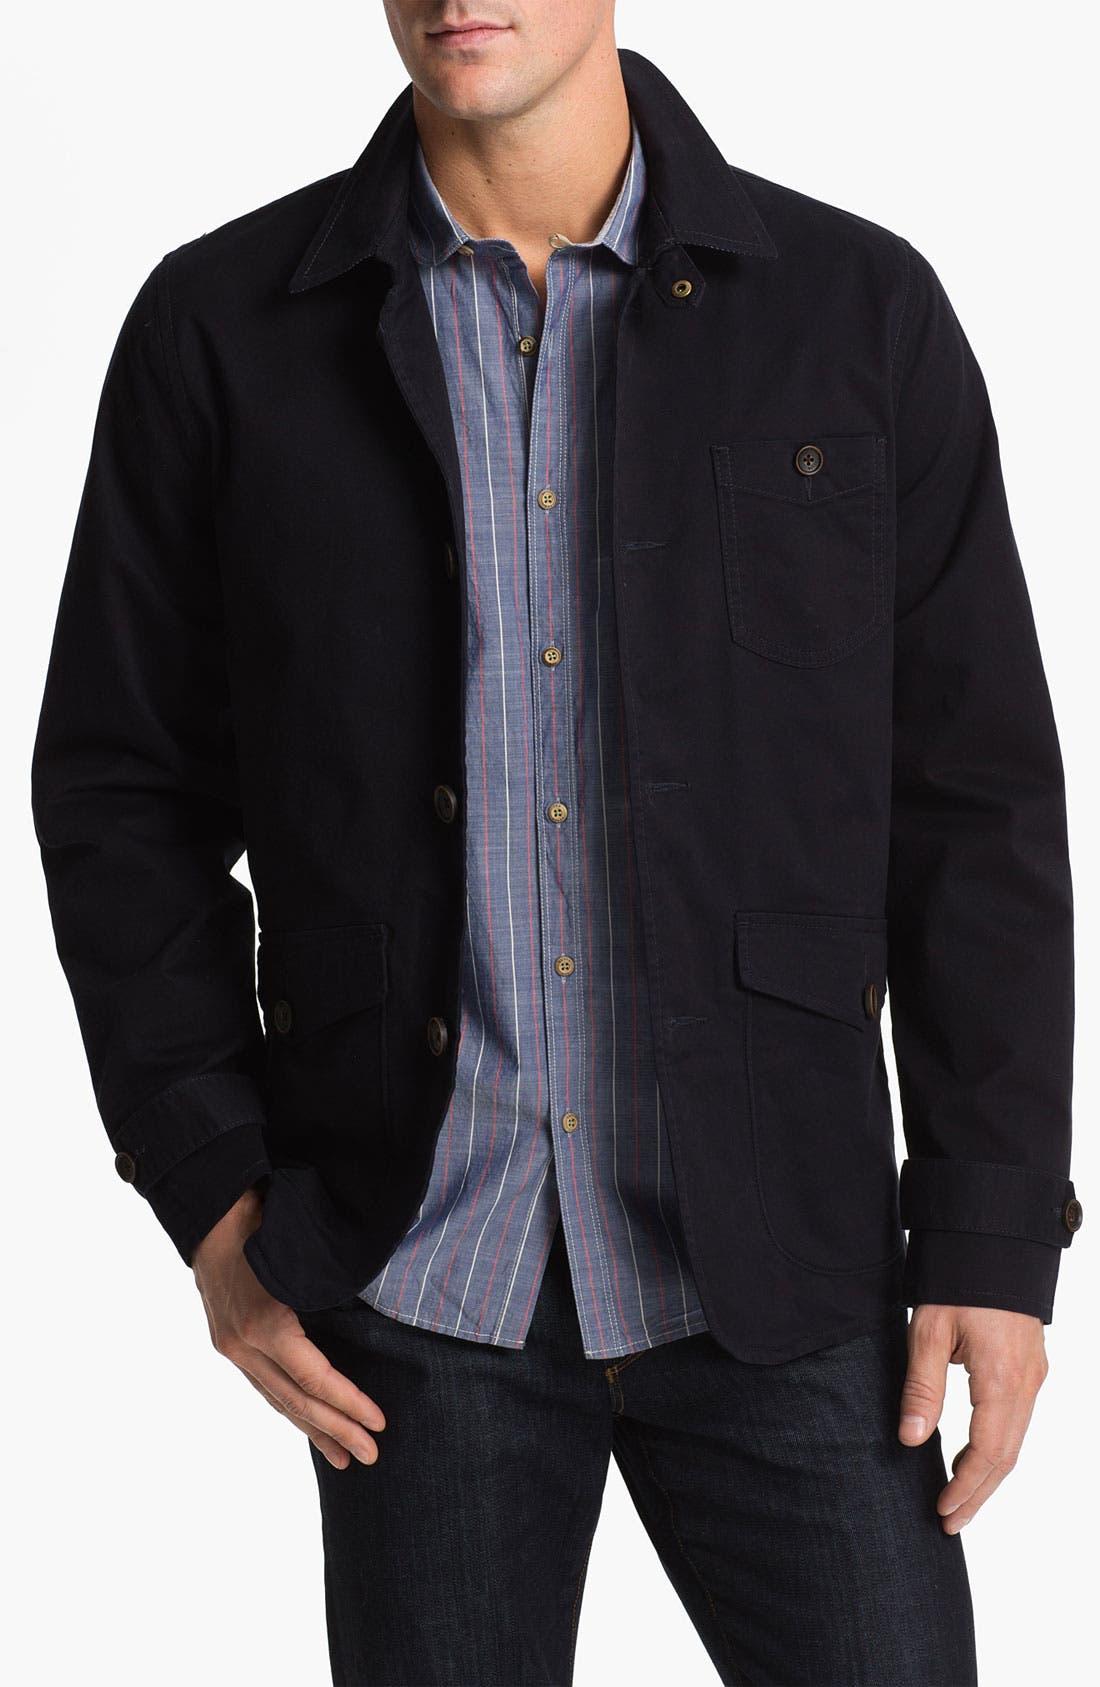 Alternate Image 1 Selected - Ted Baker London 'McLagen' Cotton Jacket